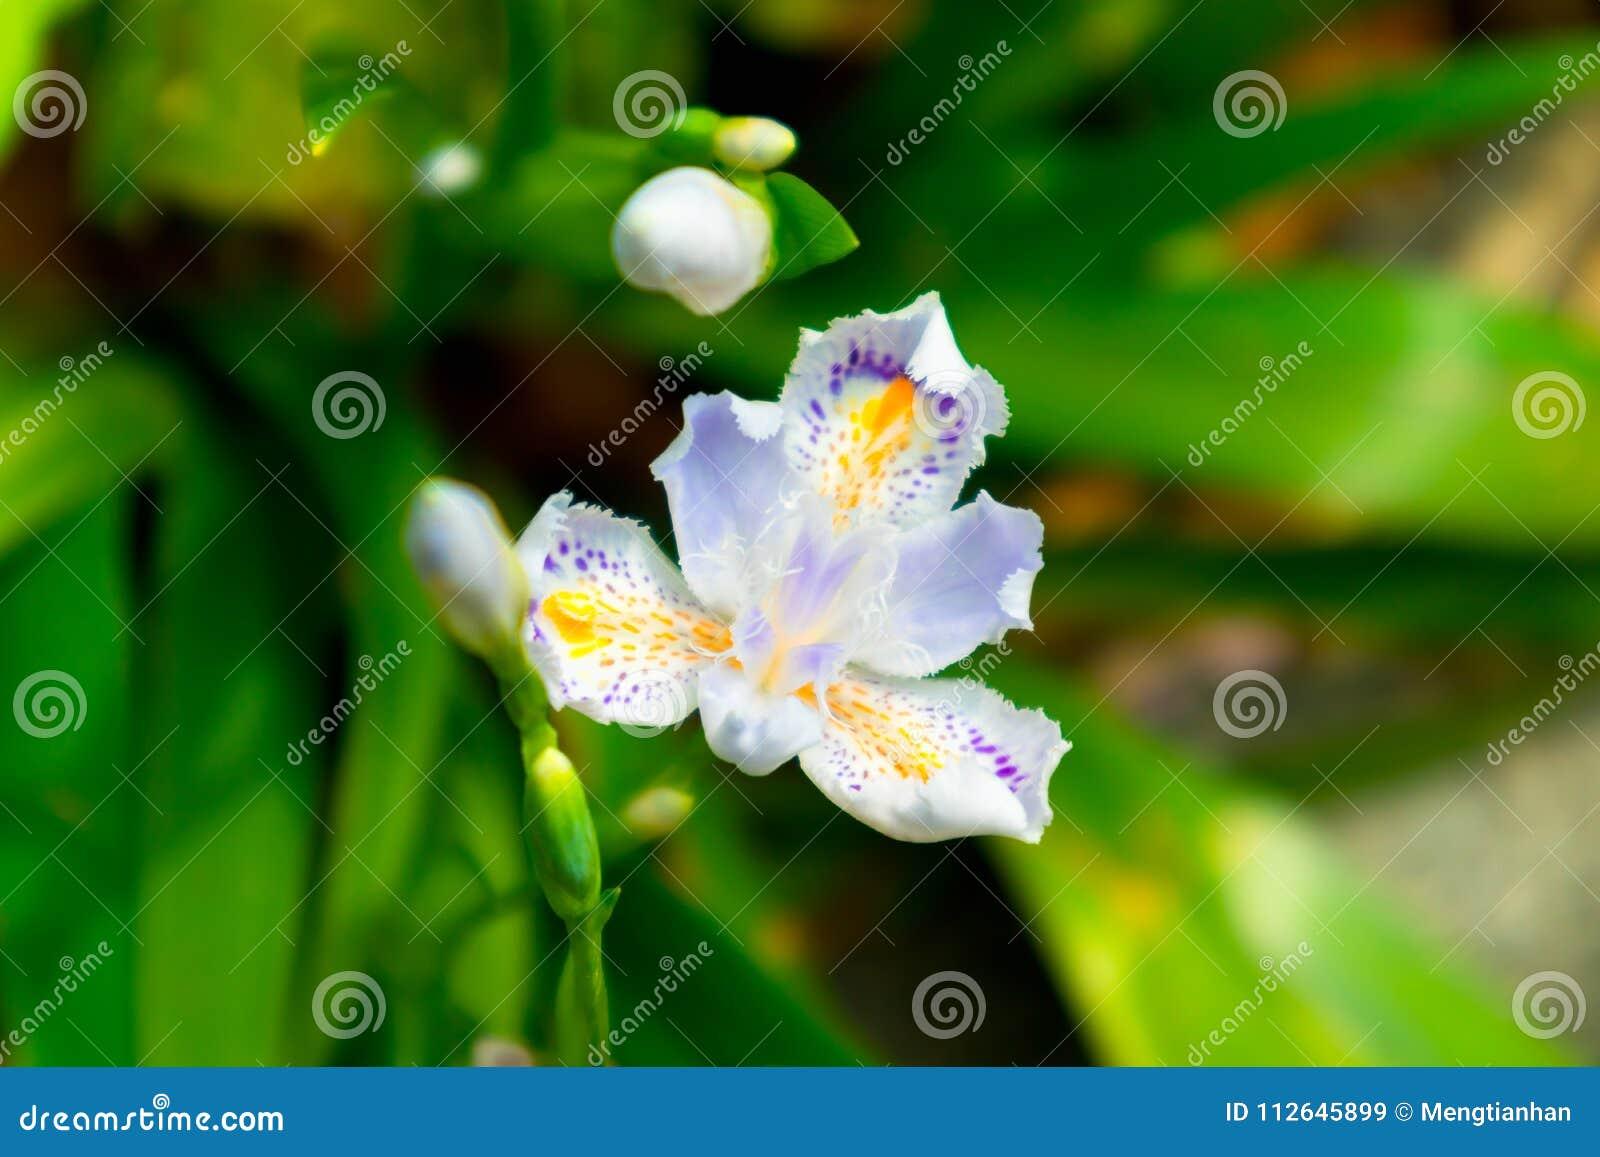 Iris Flower Perennial Herb Stock Image Image Of Deciduous 112645899